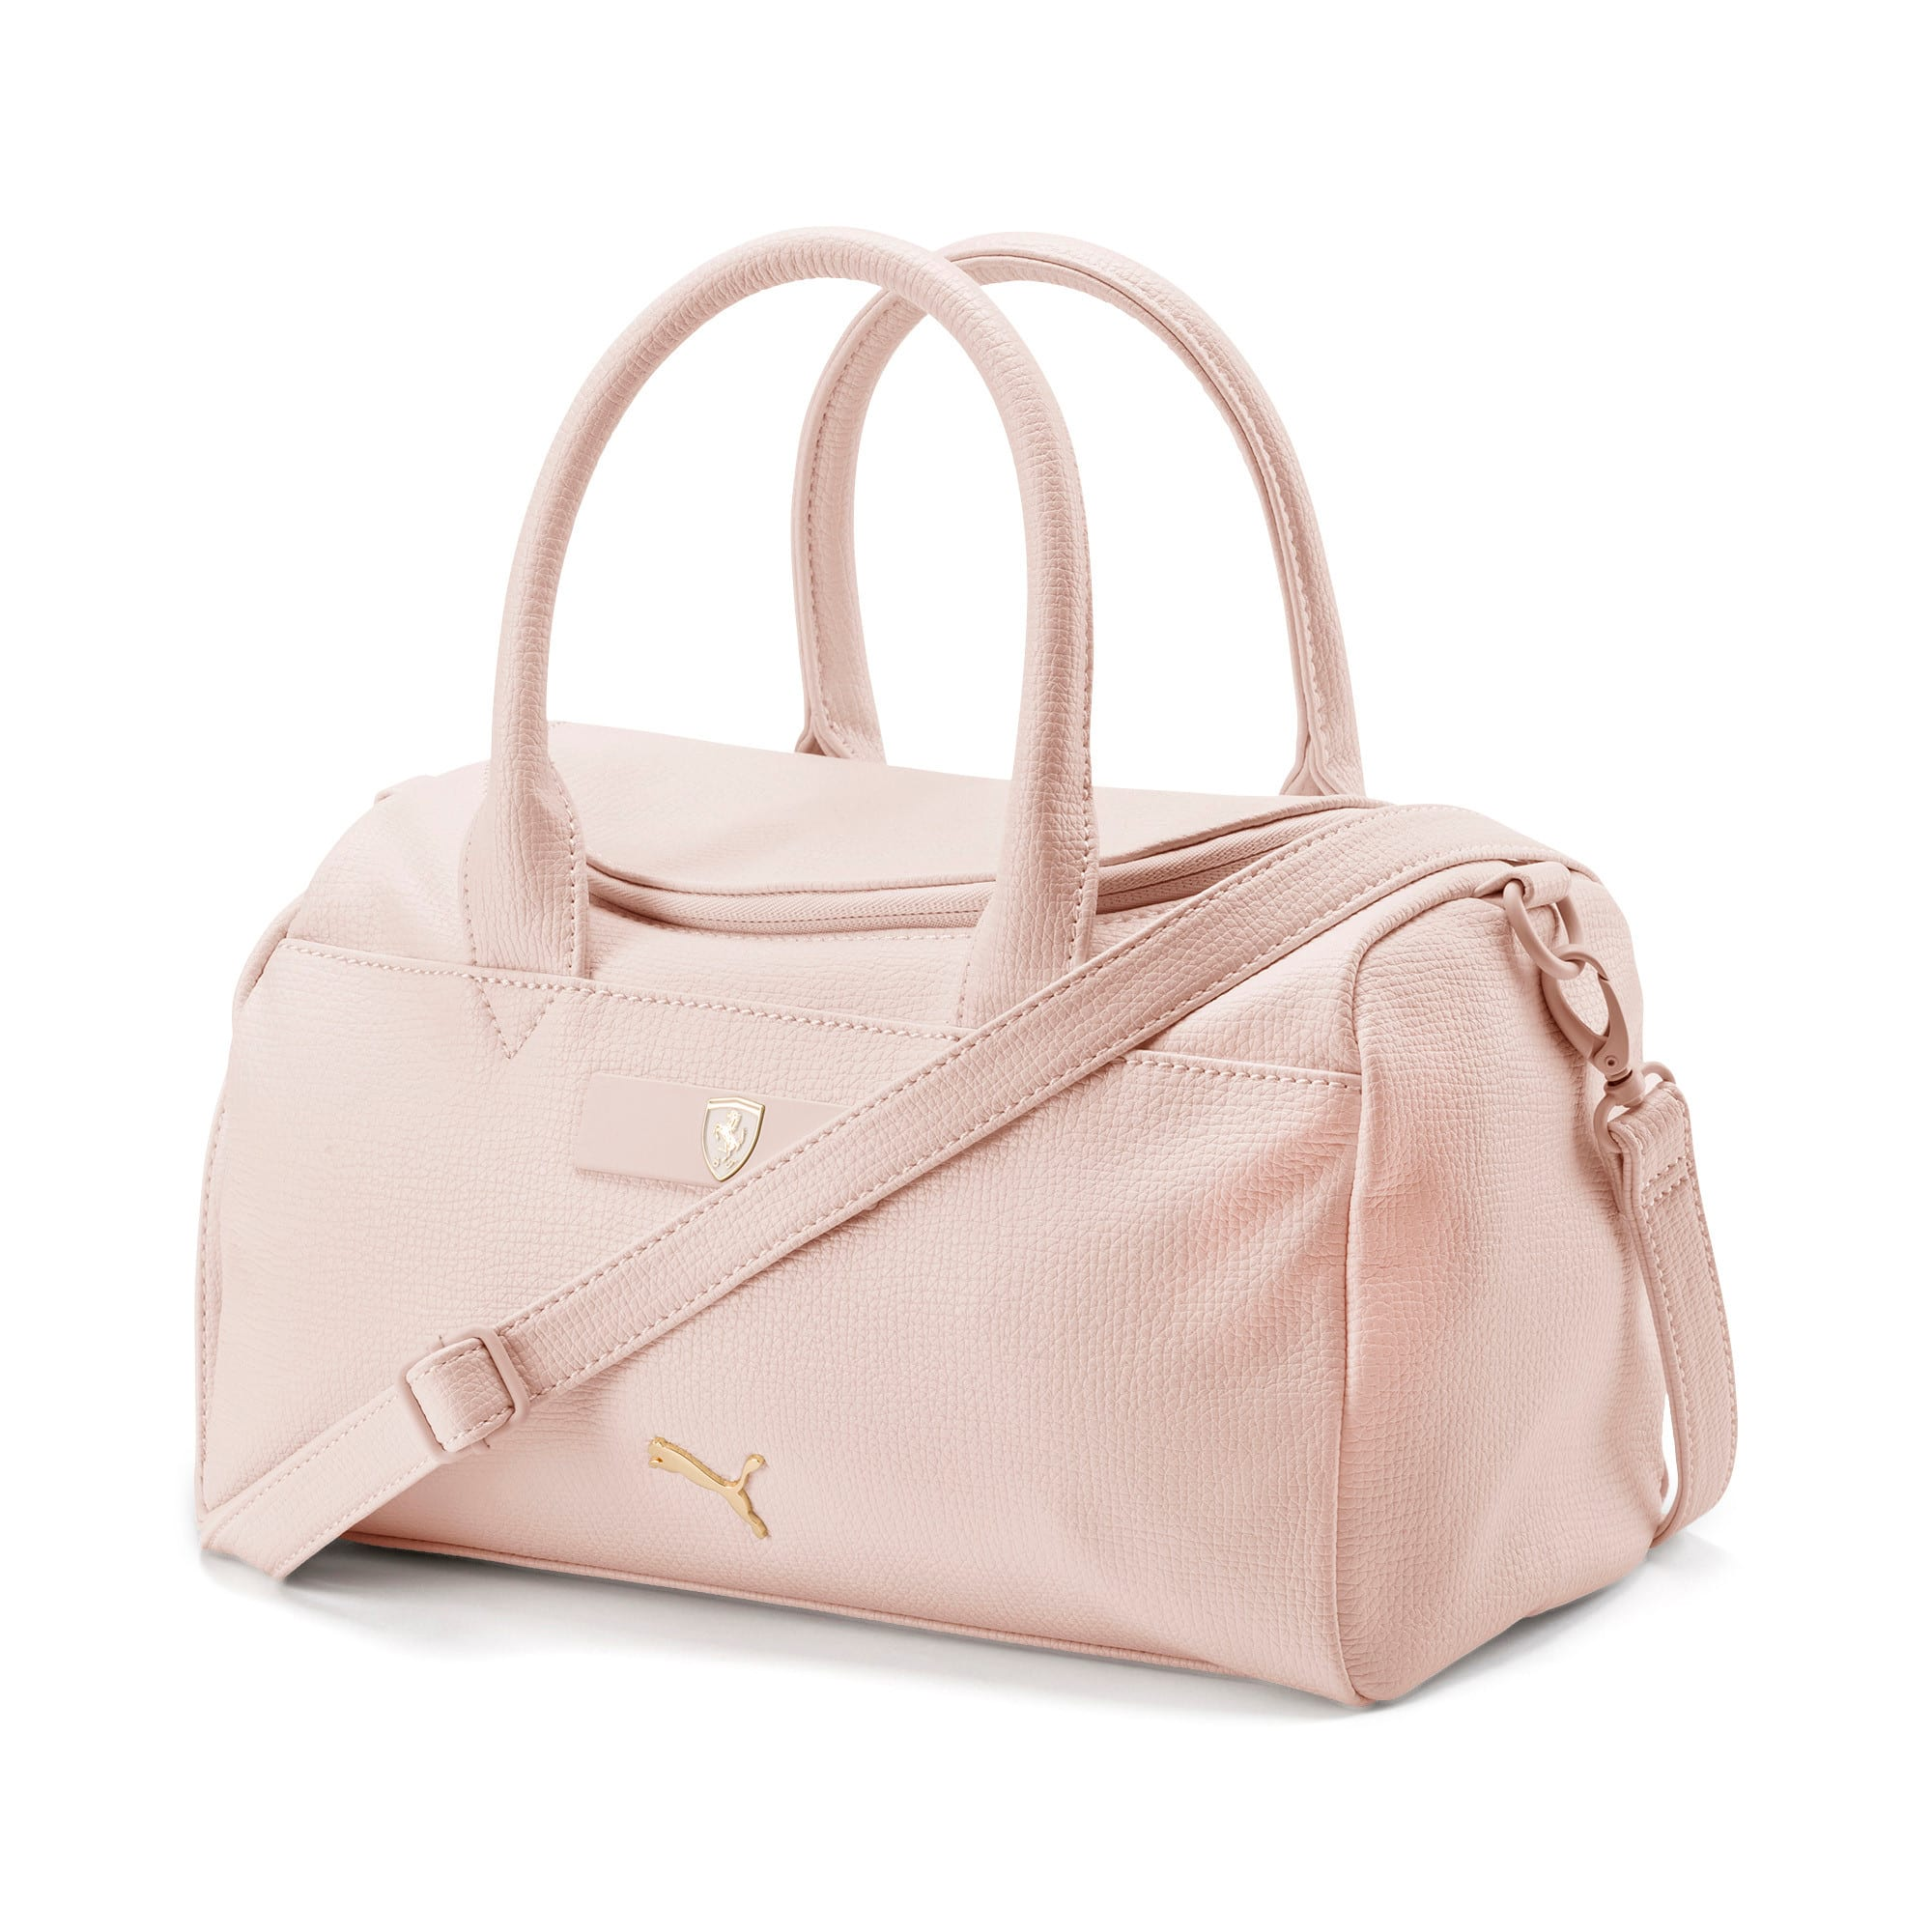 Thumbnail 1 of Ferrari Lifestyle Women's Handbag, Pastel Parchment, medium-IND